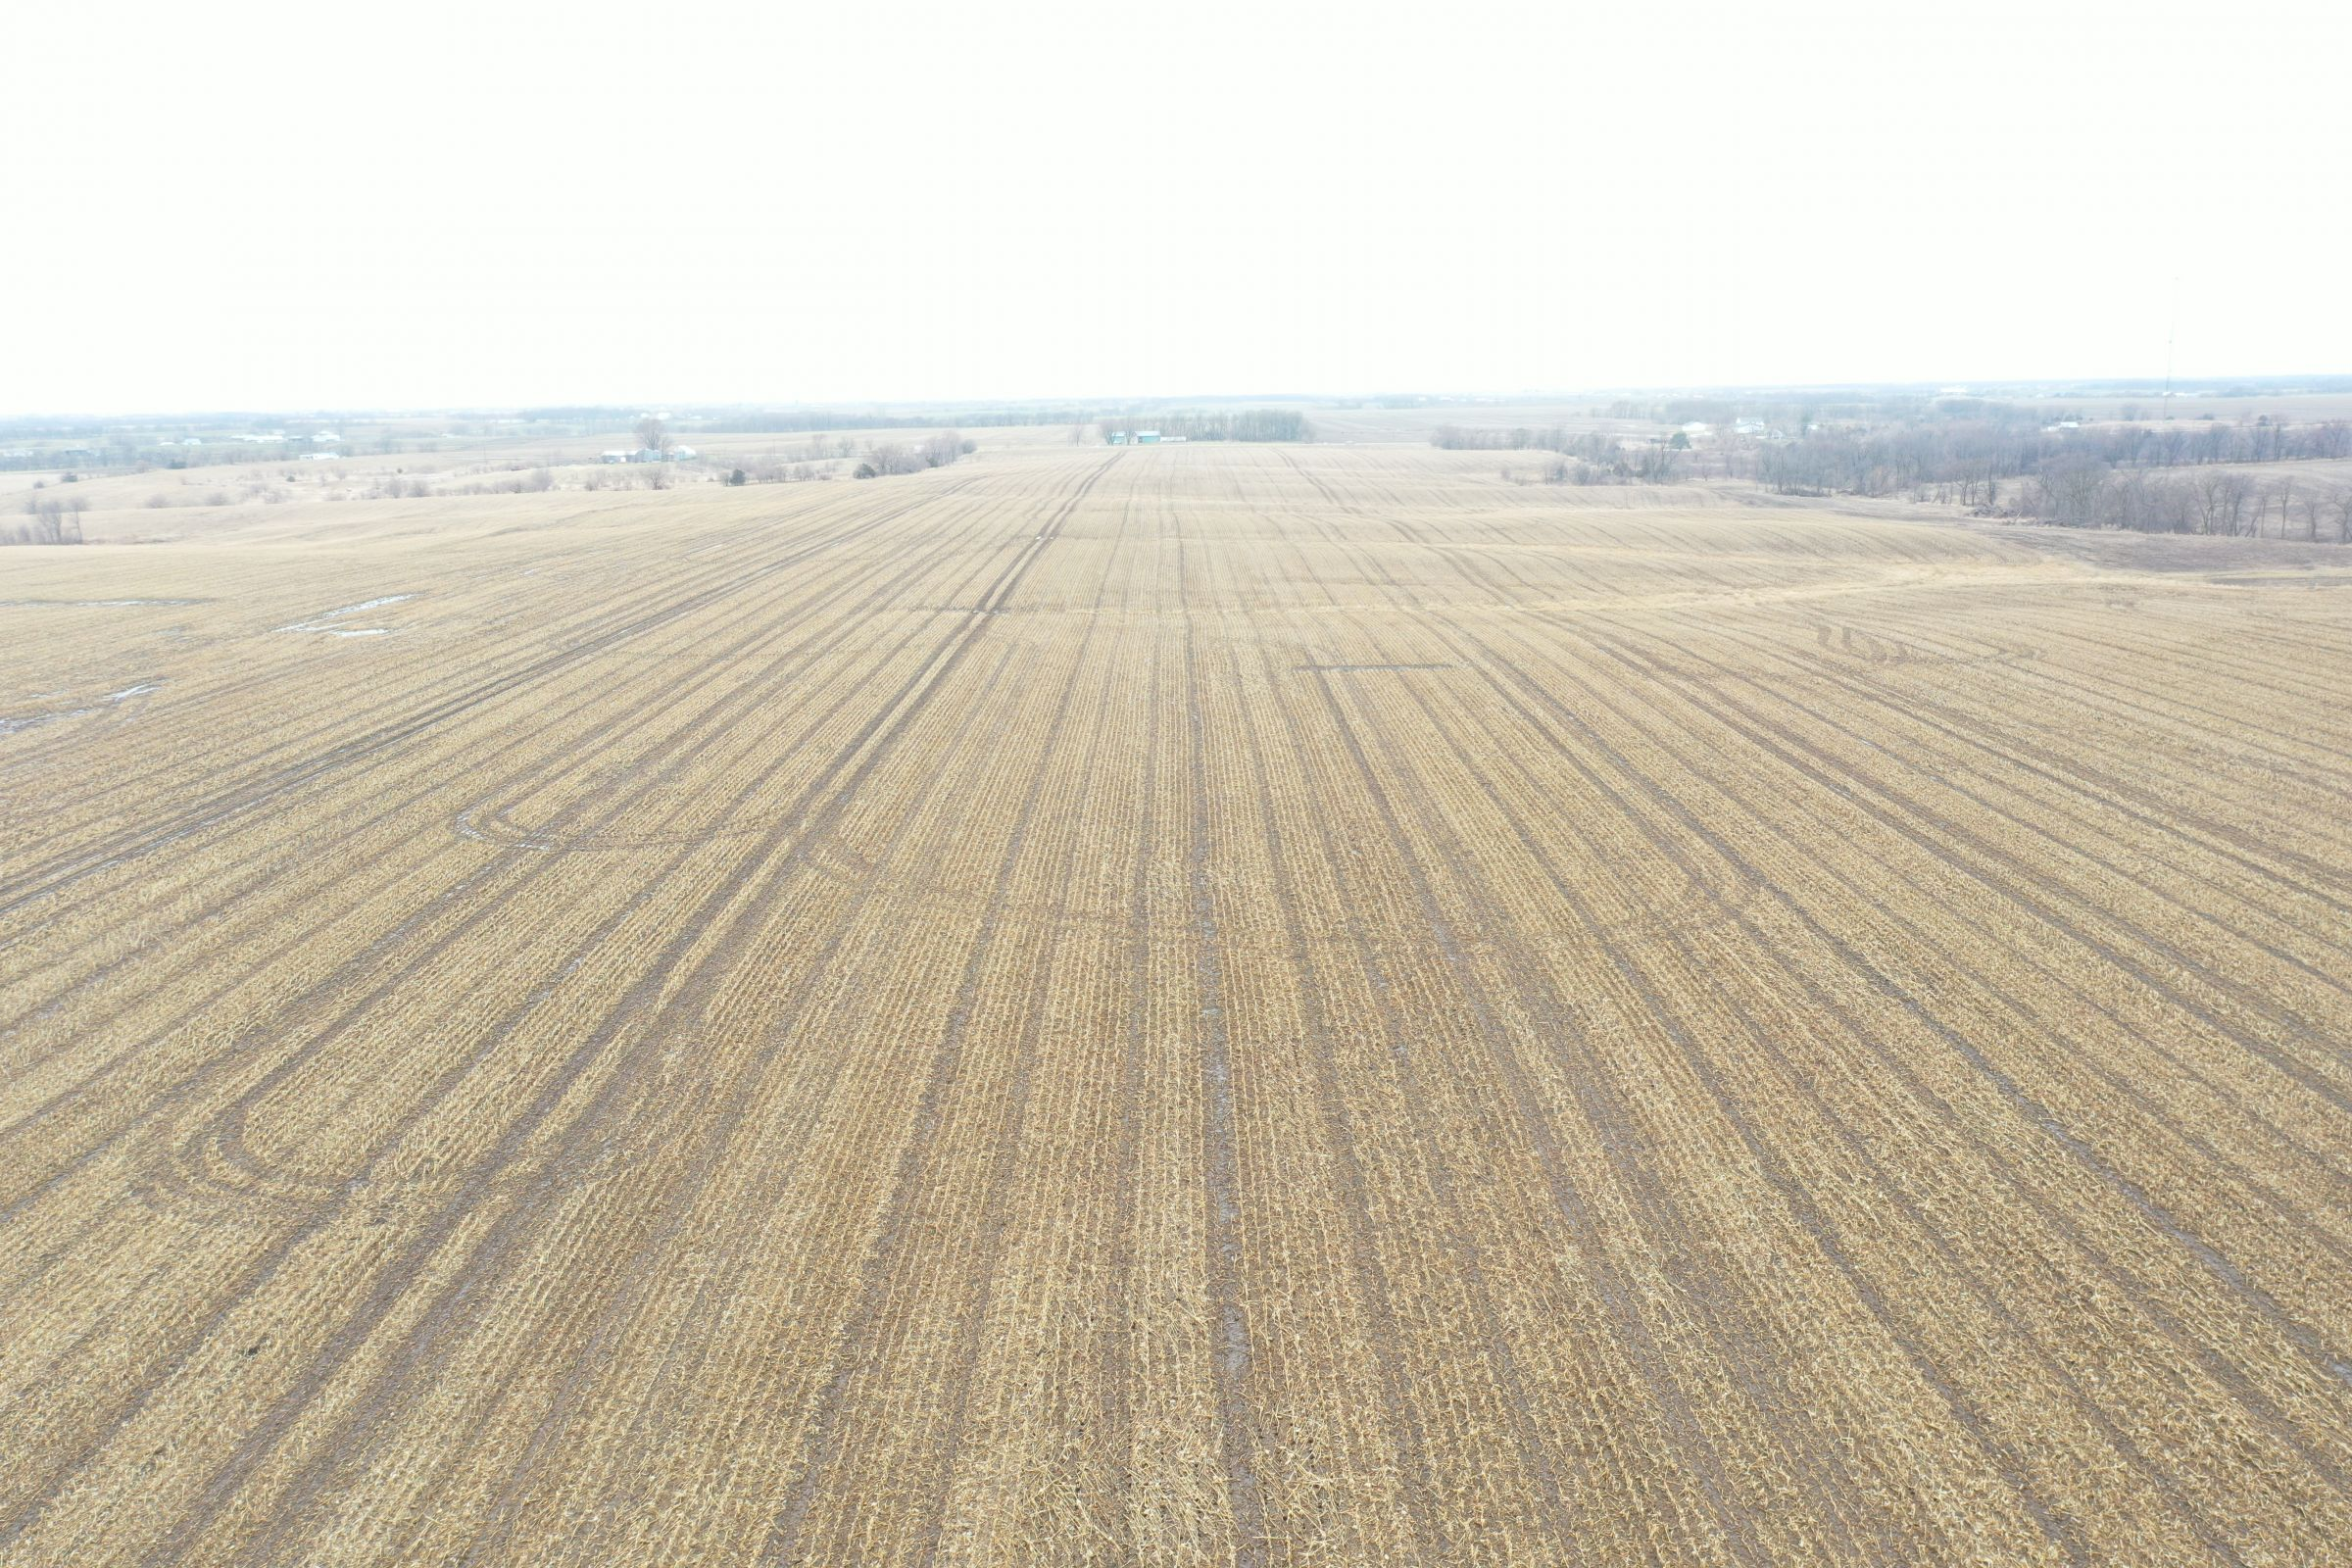 land-davis-county-iowa-180-acres-listing-number-15360-3-2021-03-19-143914.JPG